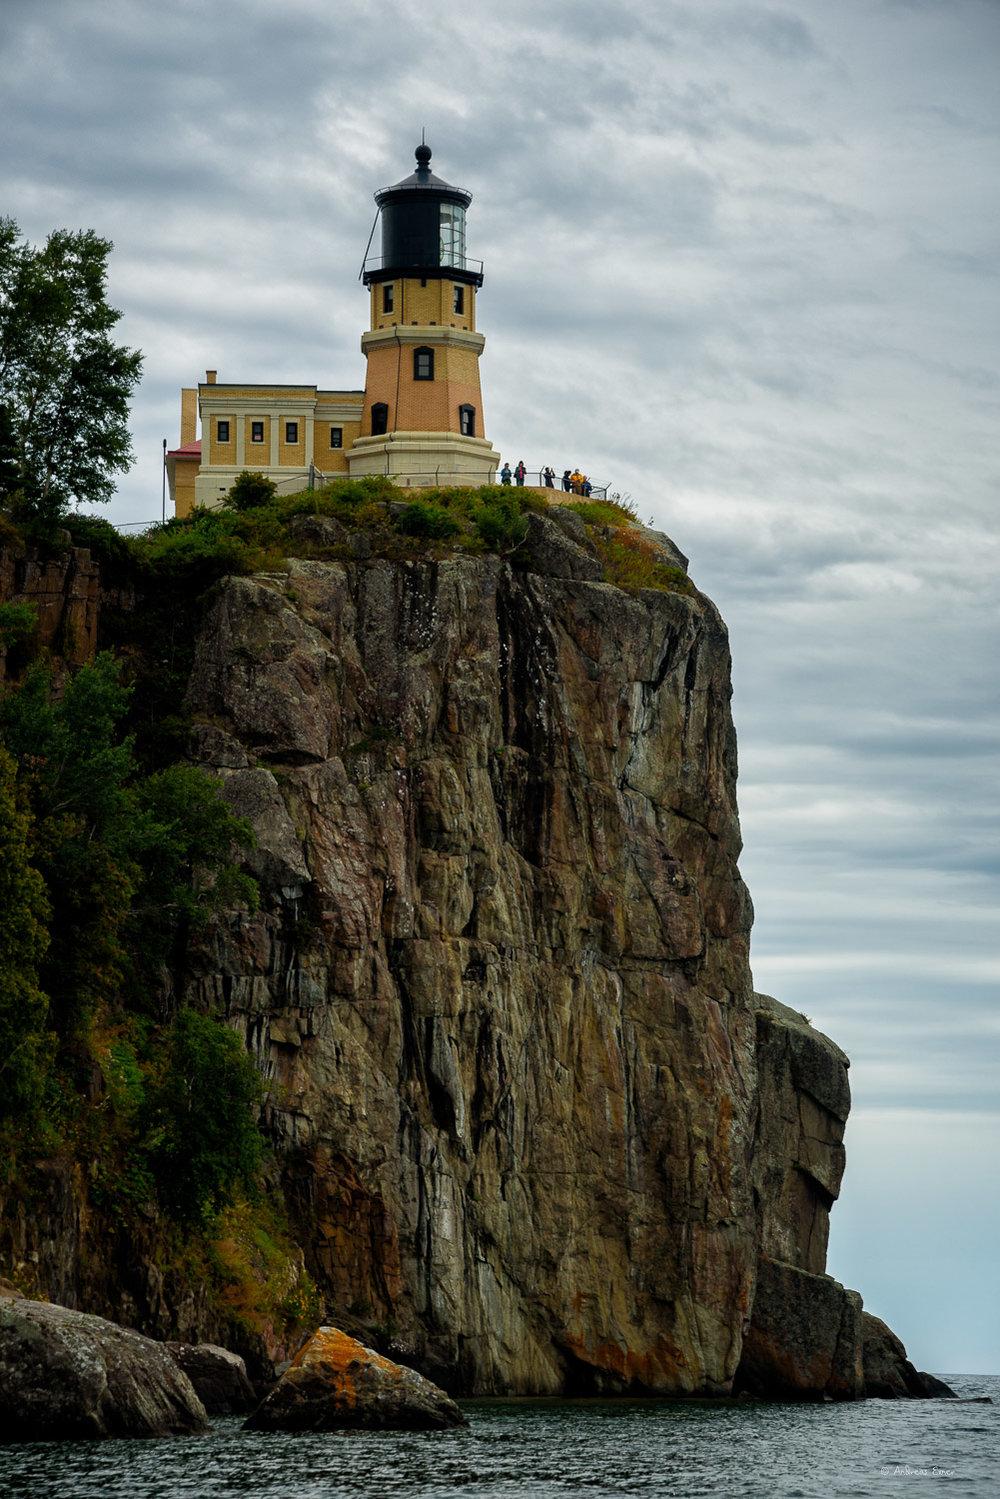 Split Rock Lighthouse, Two Harbors, Minnesota, put into service in 1910